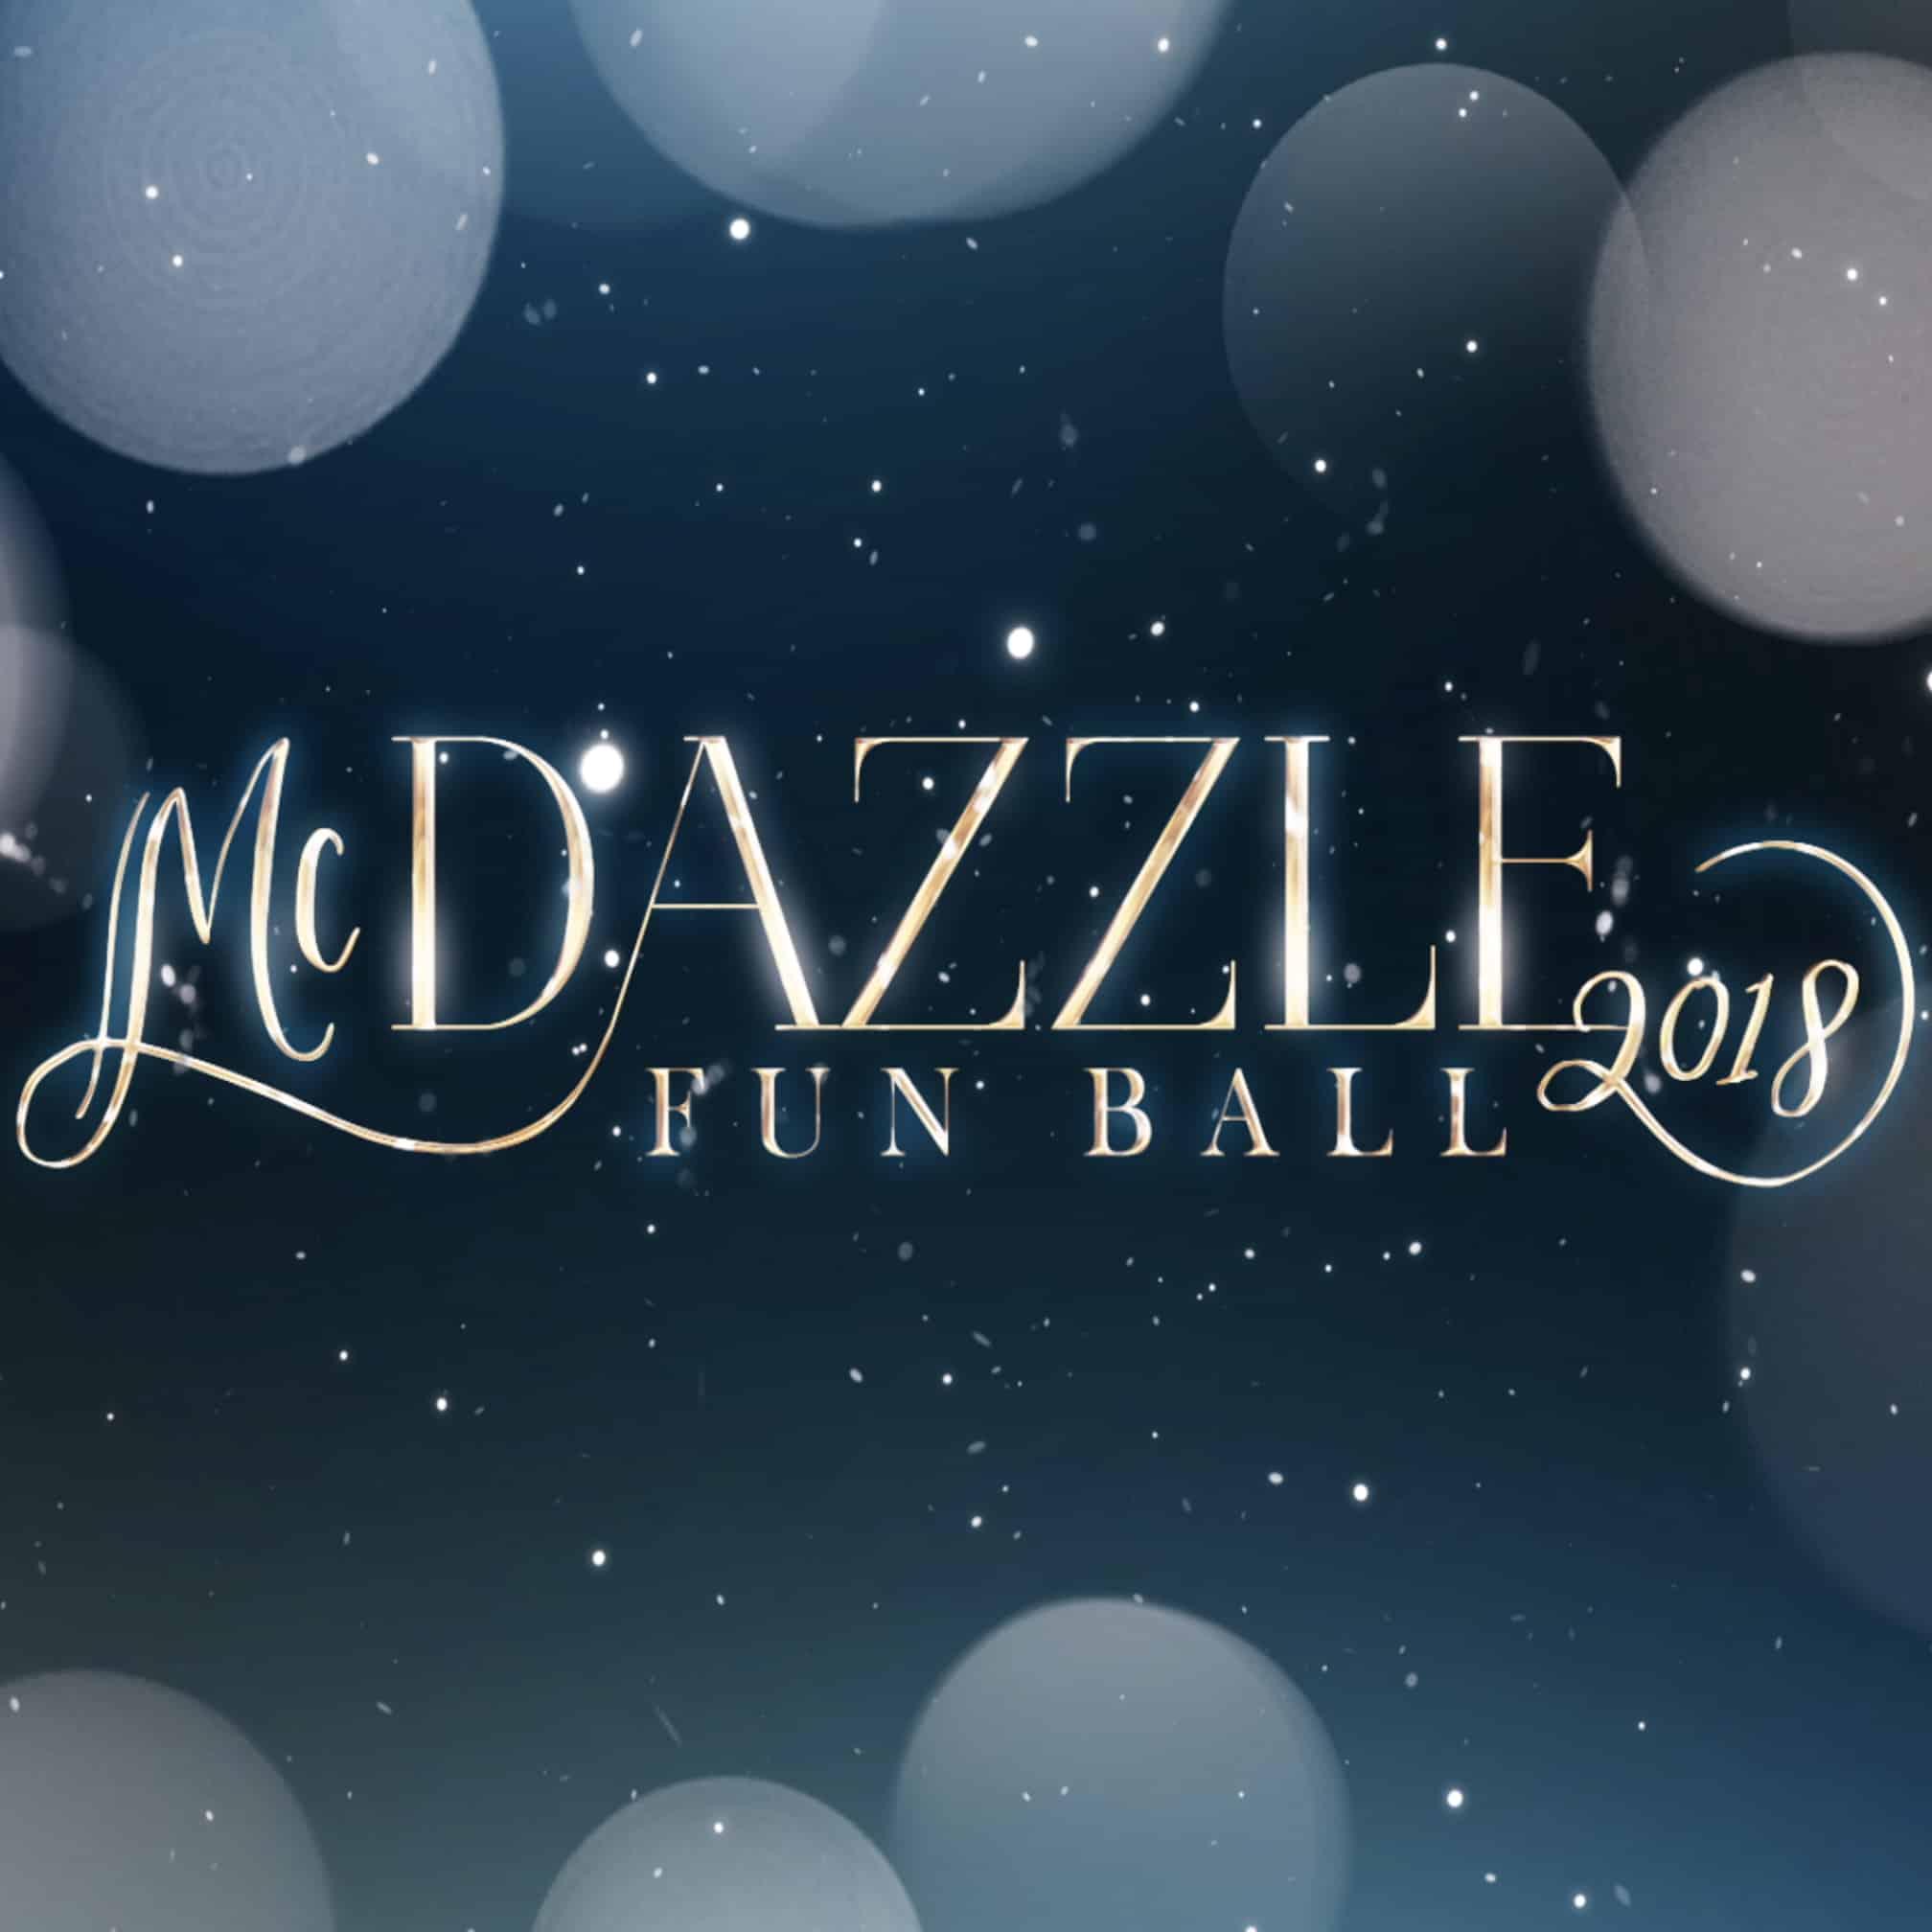 McDazzle 2018 event videos